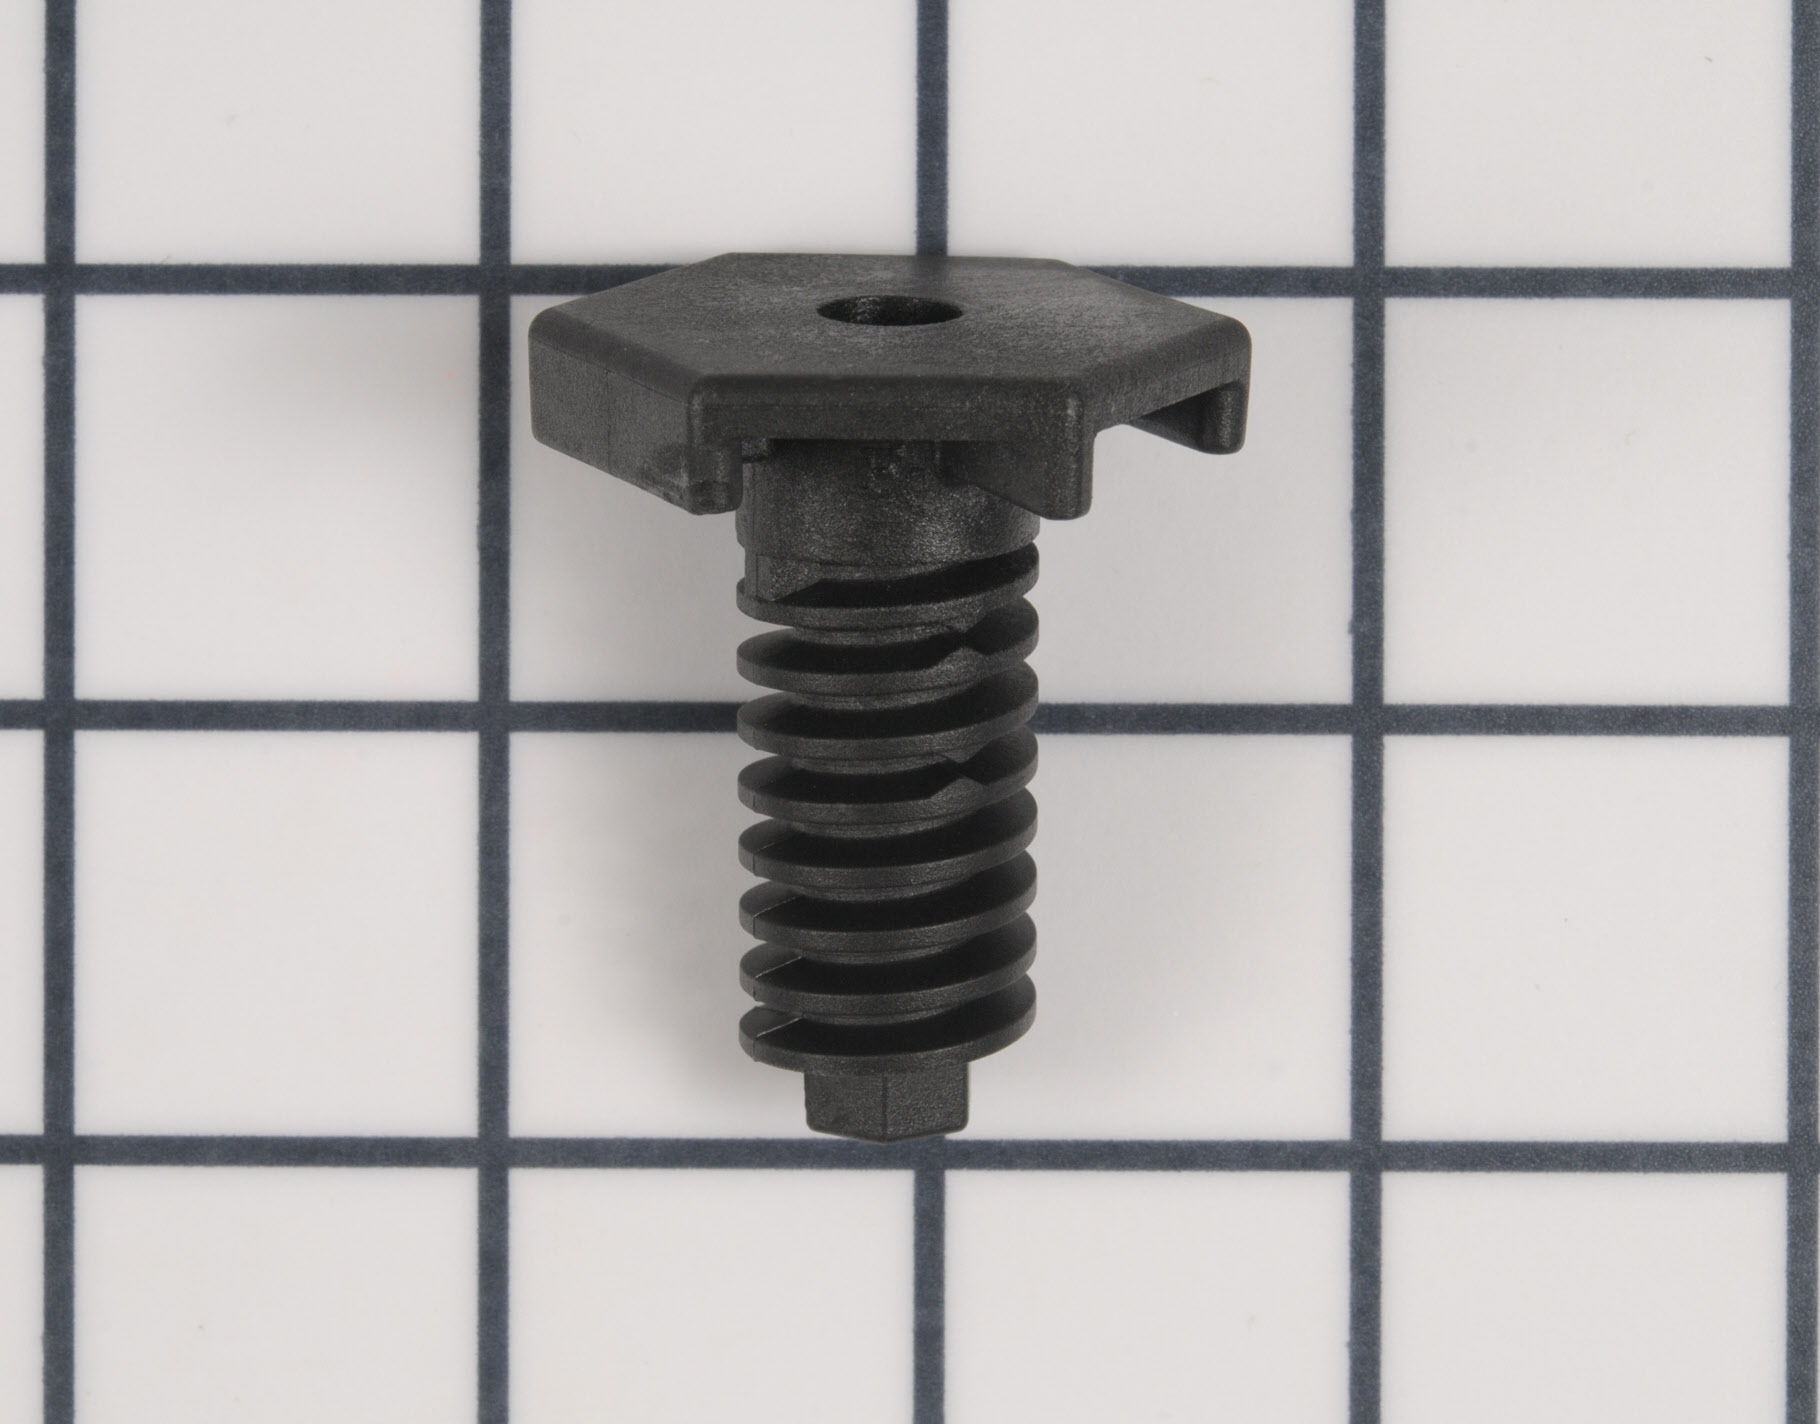 Whirlpool Freezer Part # WP3-82710-001 - Leveling Leg